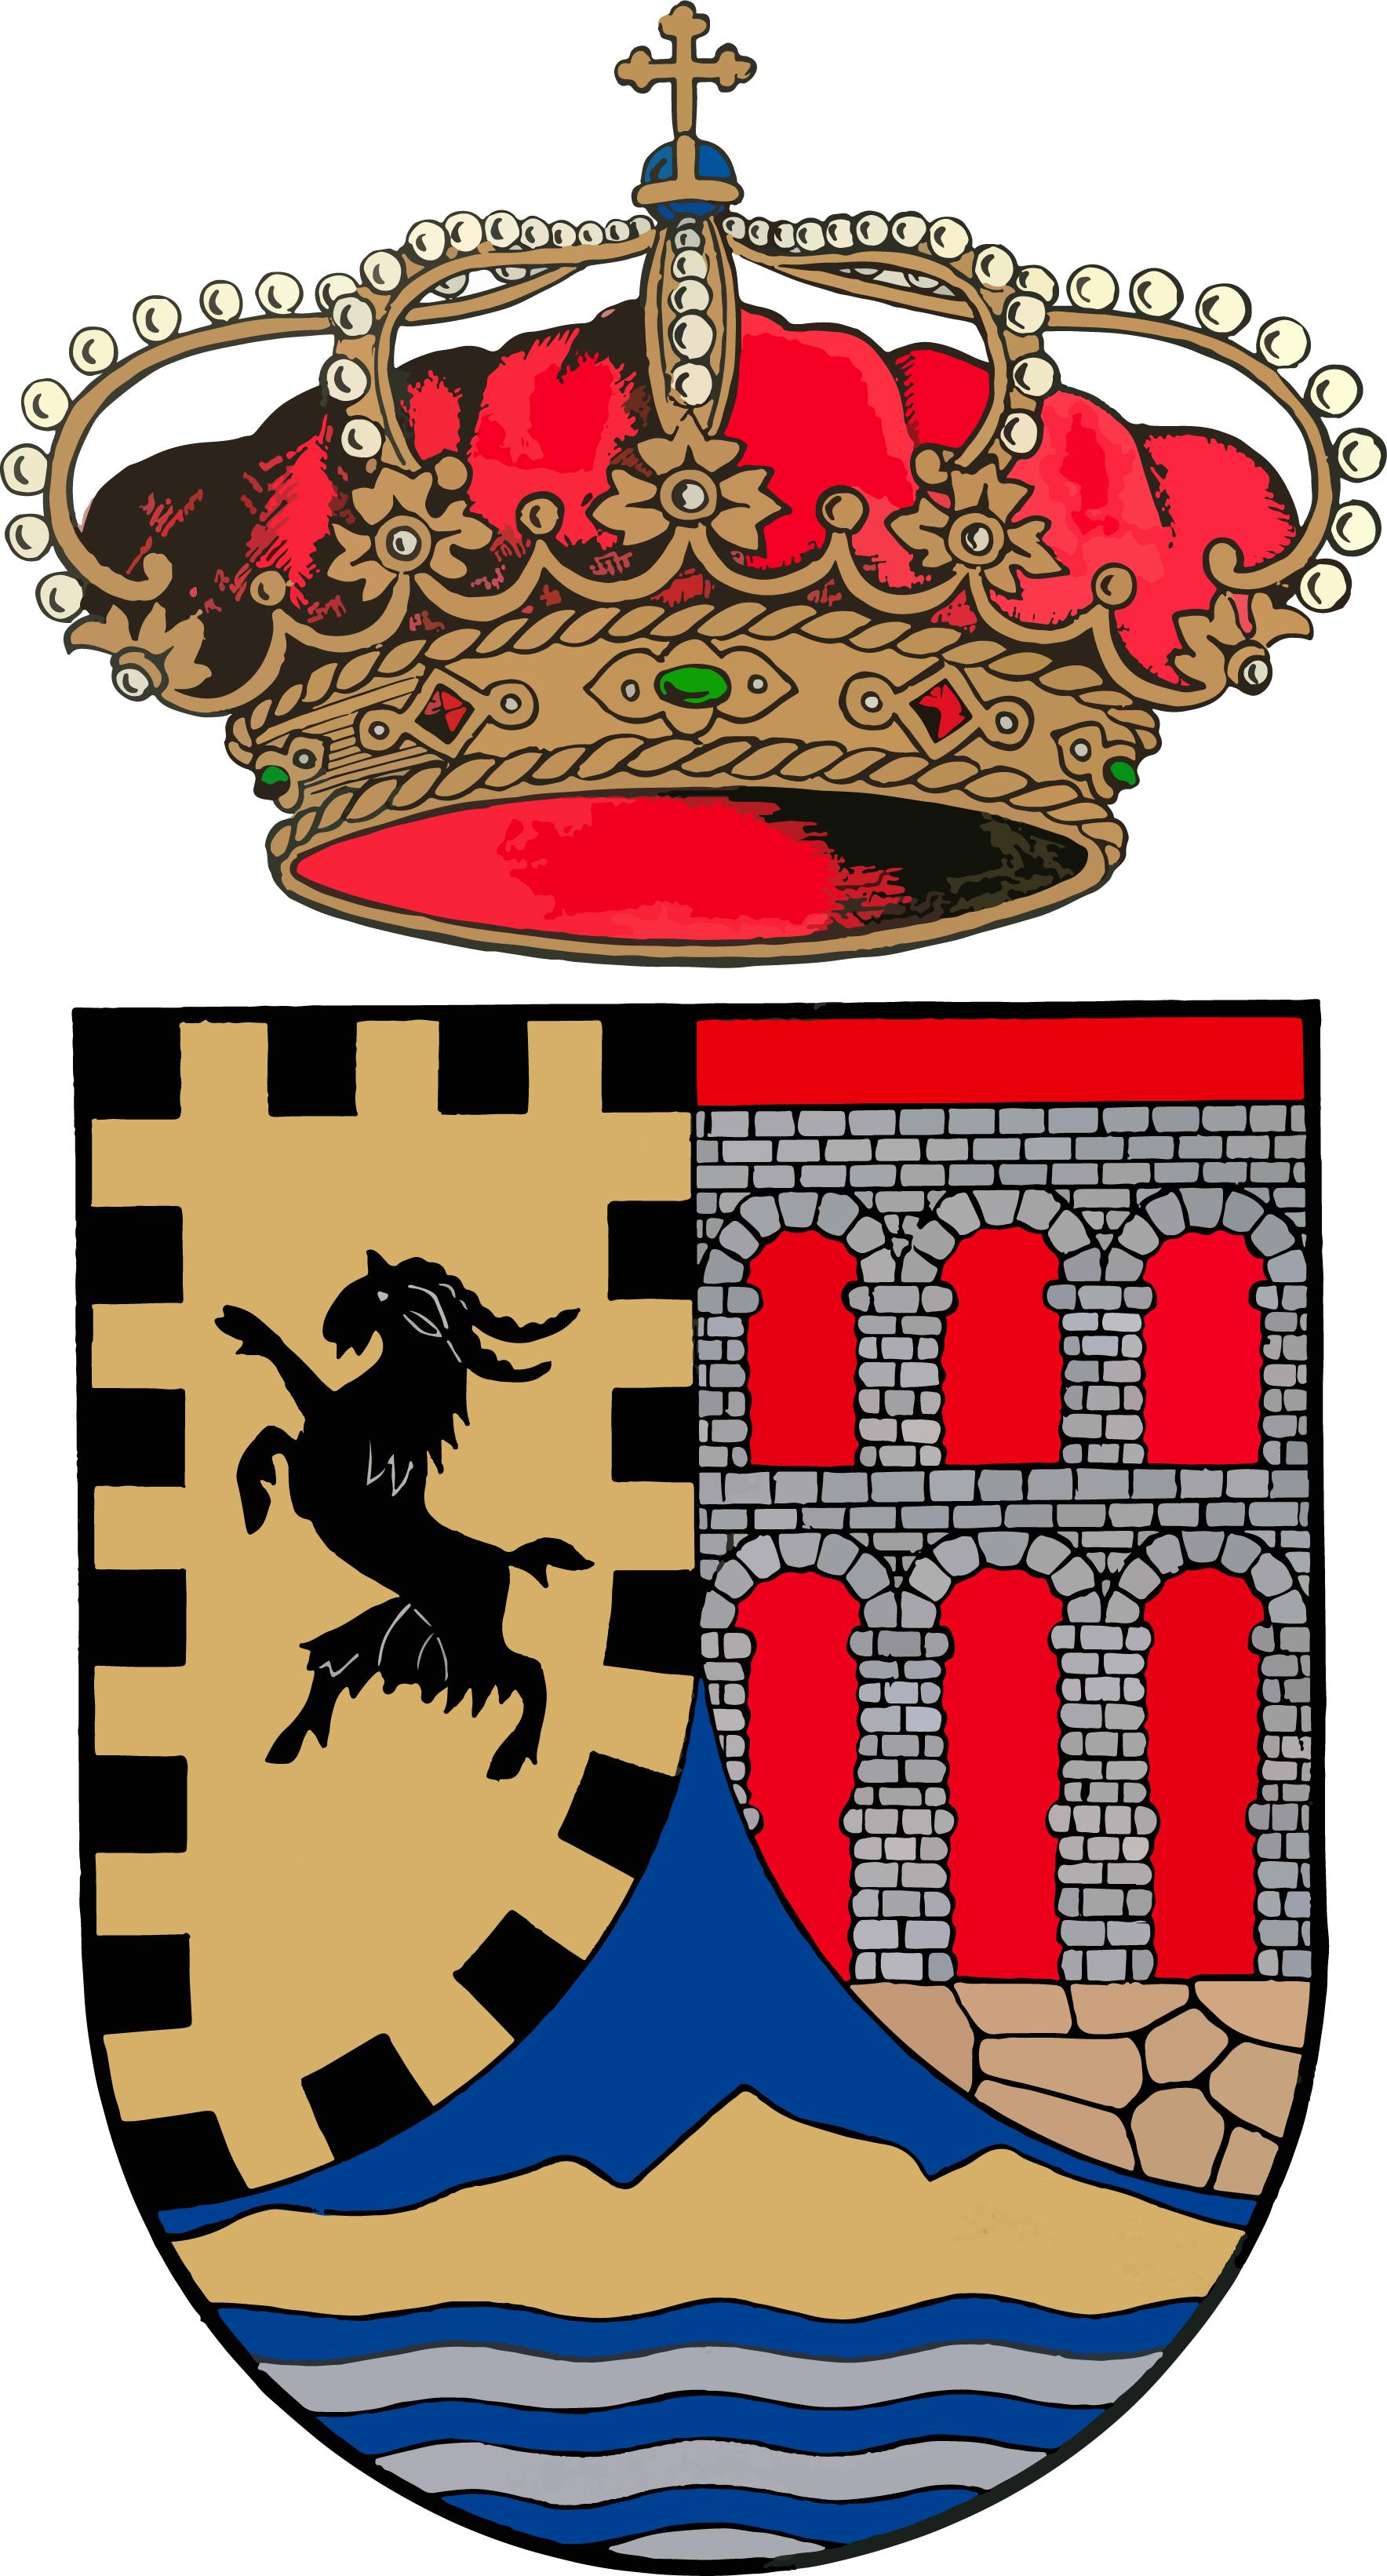 Escudo valdelaguna.jpg